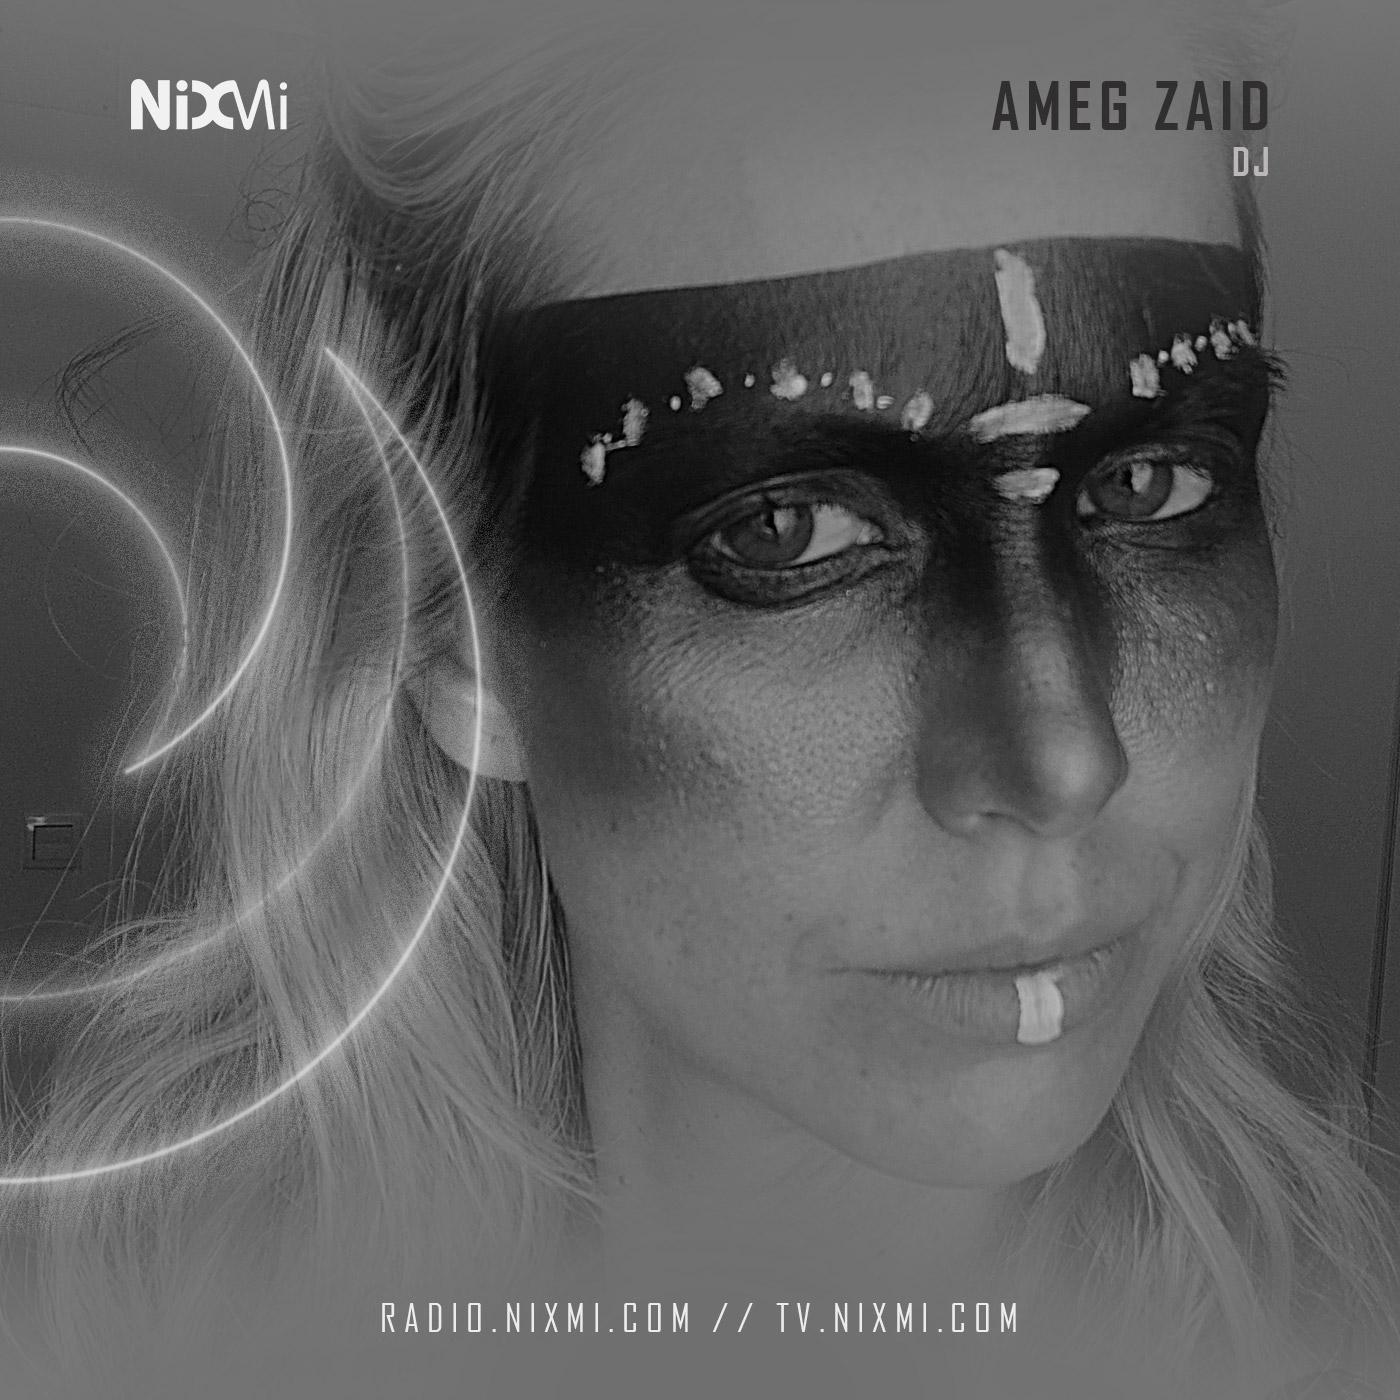 2021—Nixteam-AMEG-ZAID-NIXMI